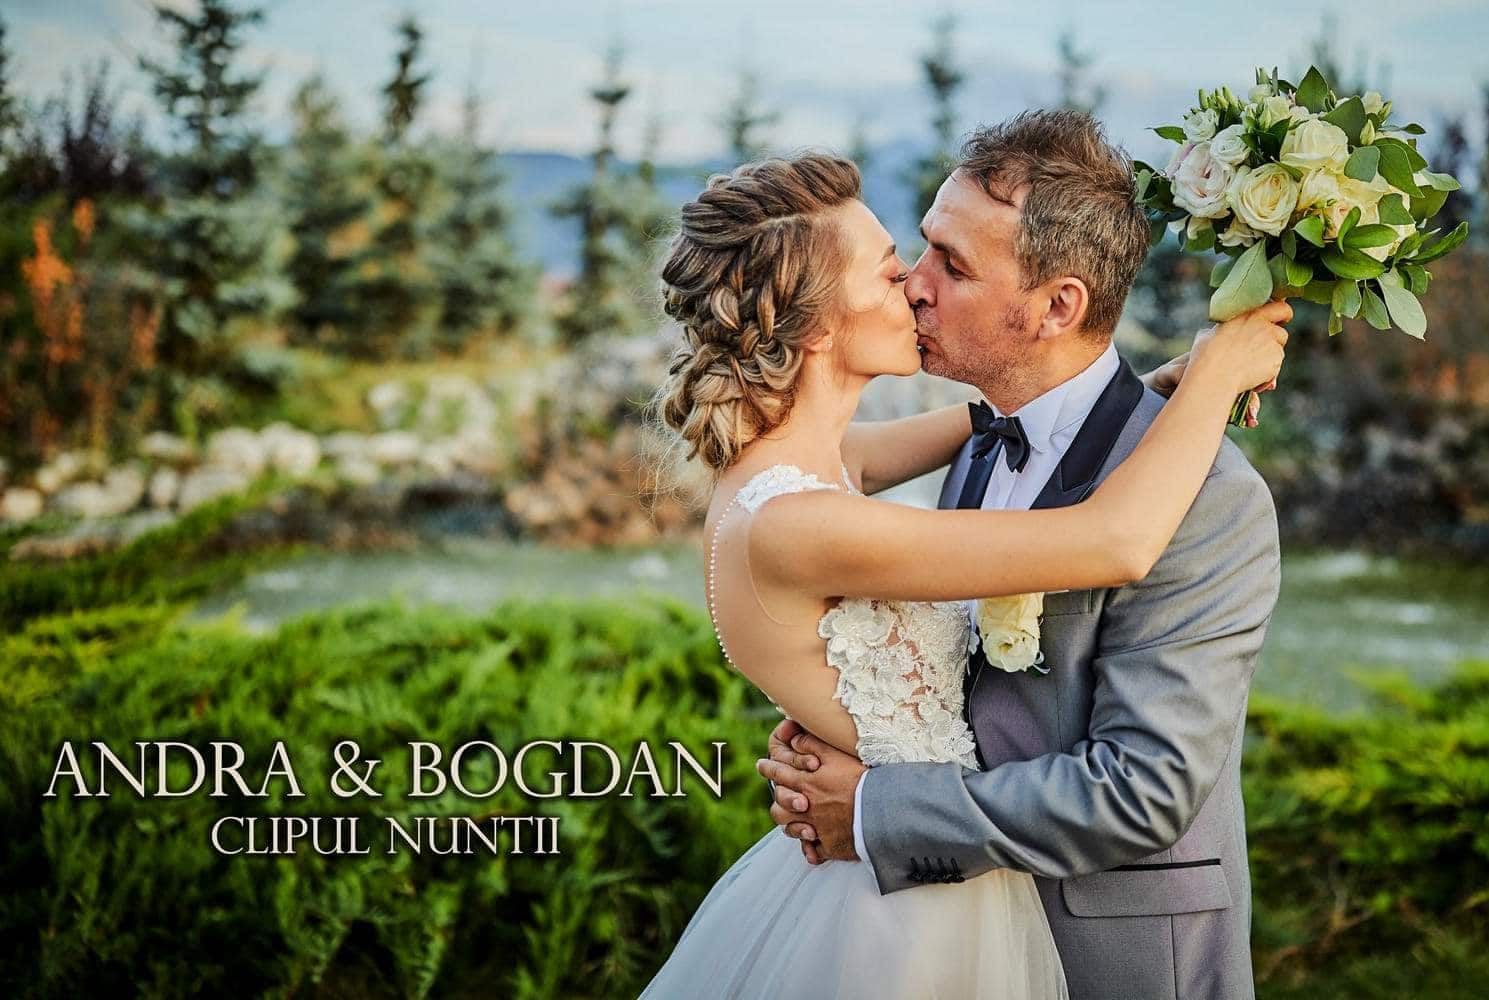 Nunta Tess Brasov - clipul nuntii